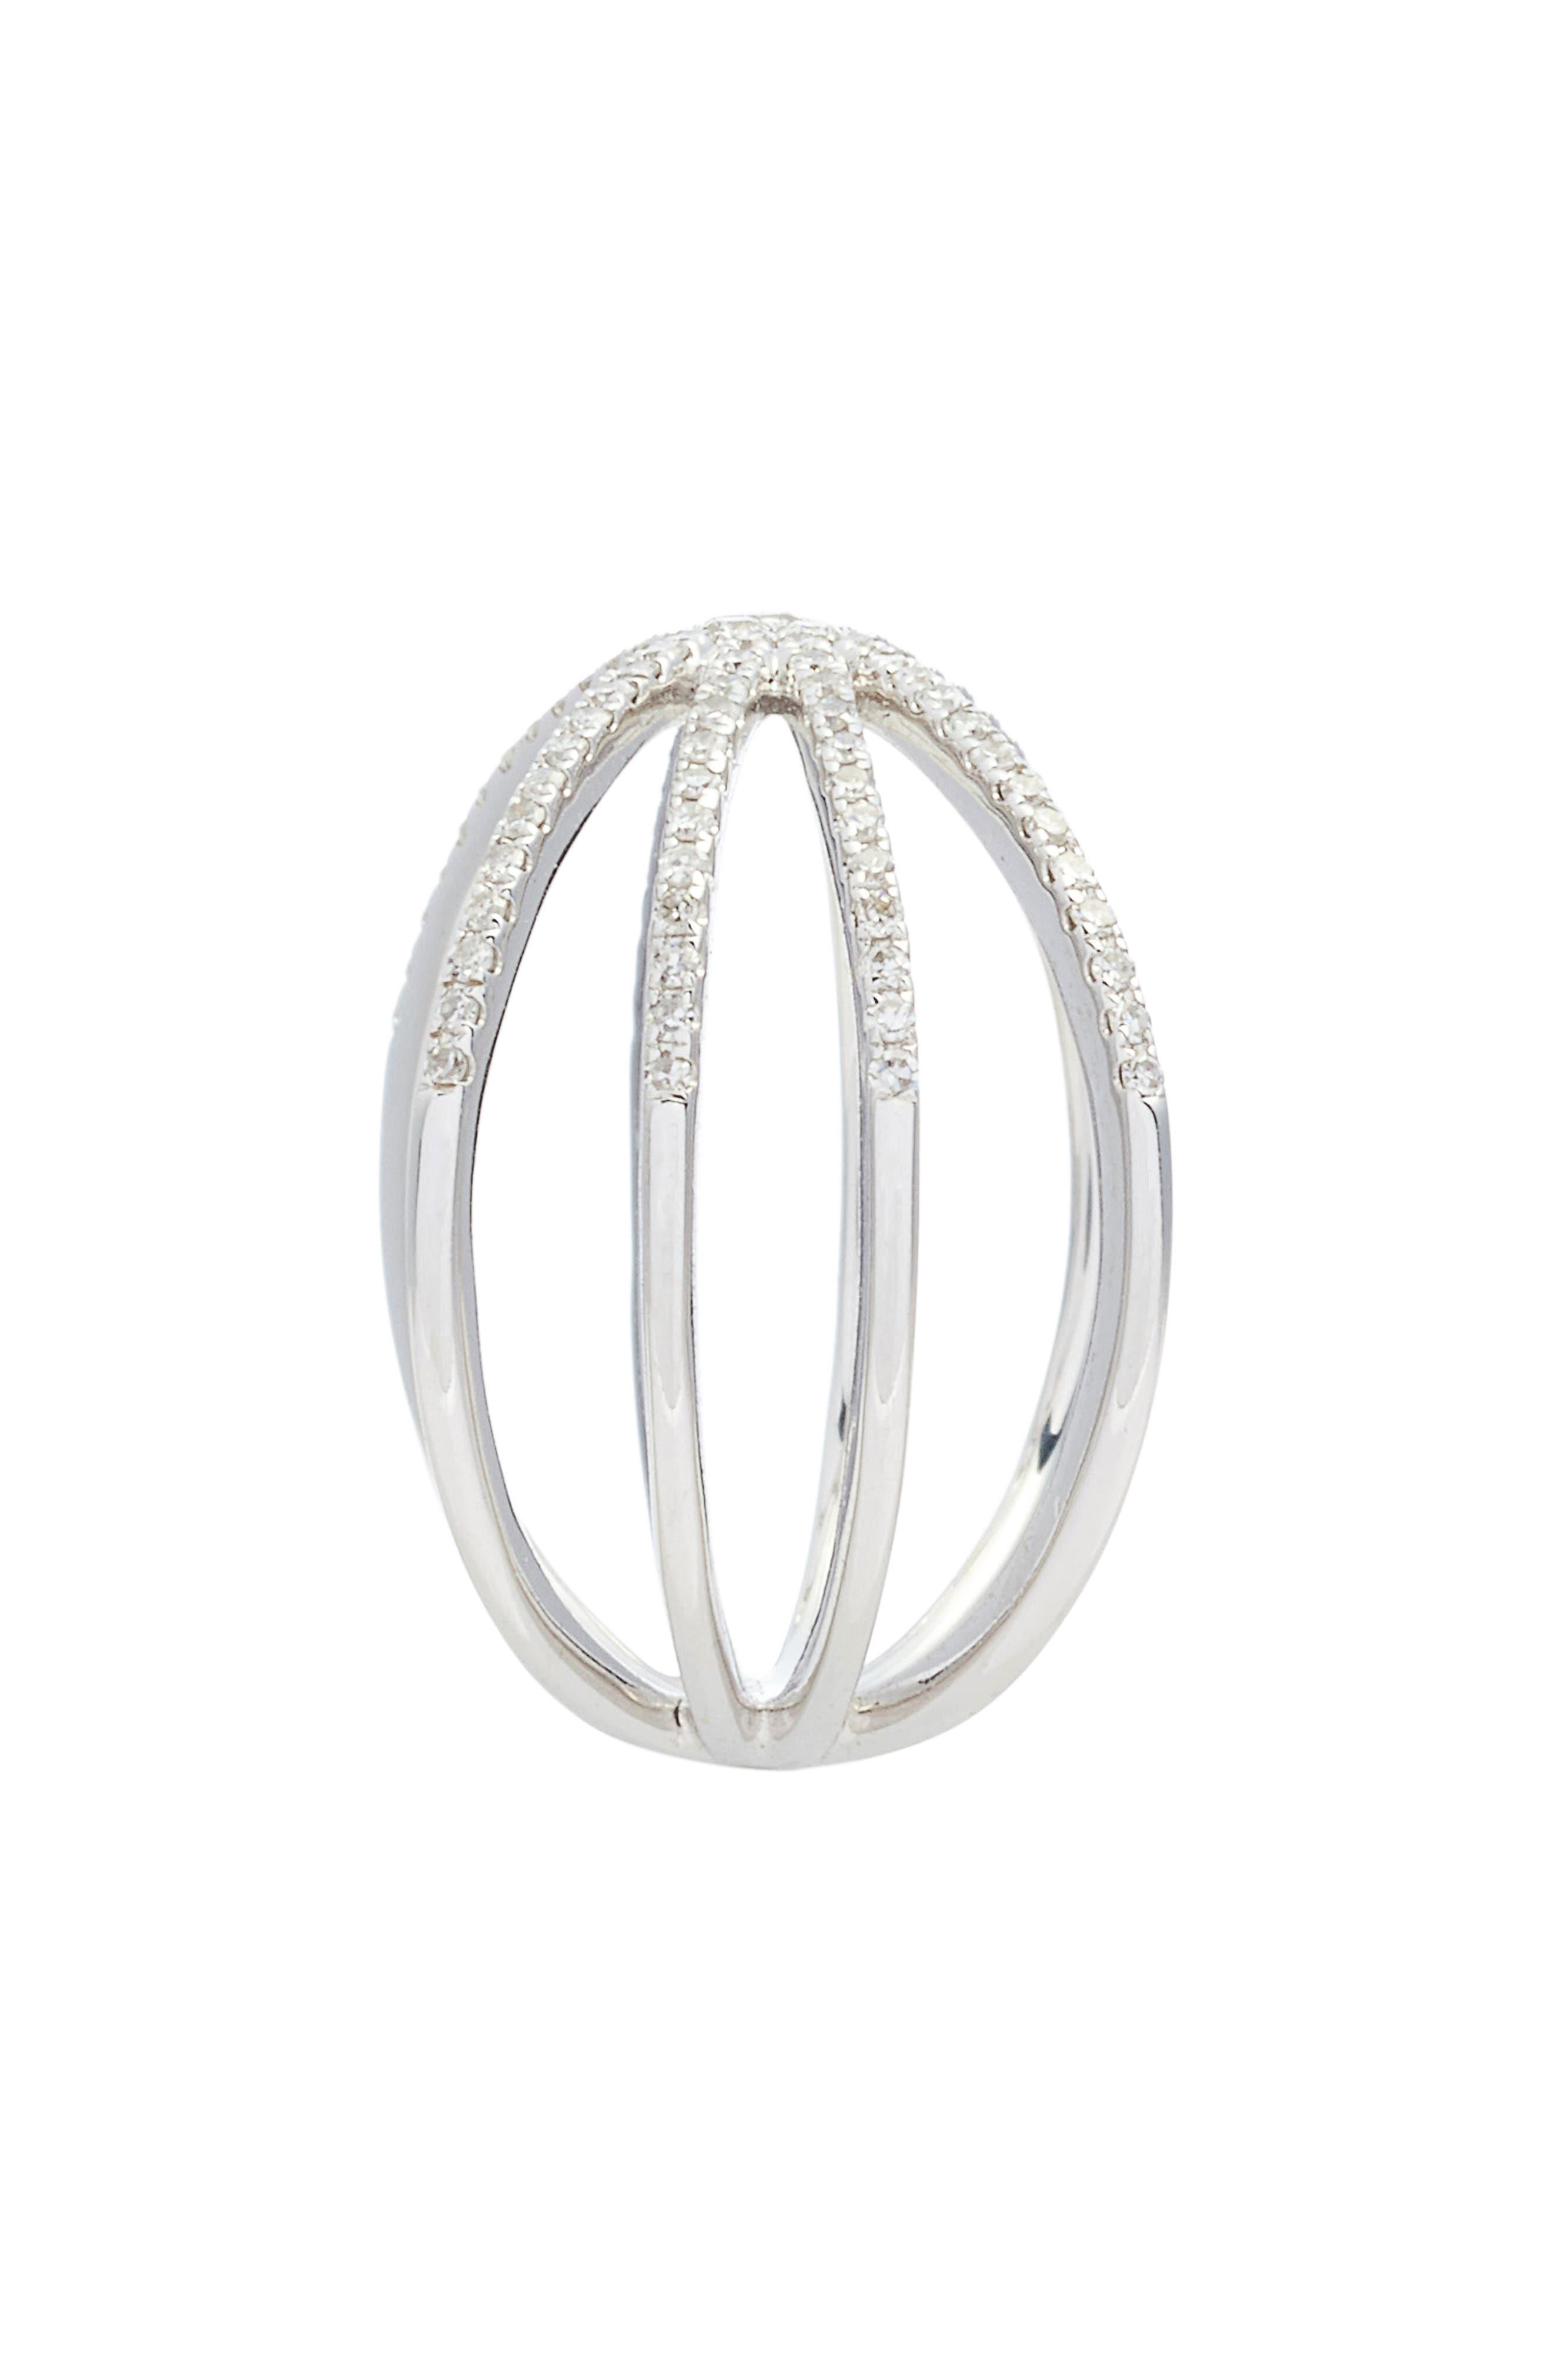 Sunburst Diamond Ring,                             Alternate thumbnail 2, color,                             711